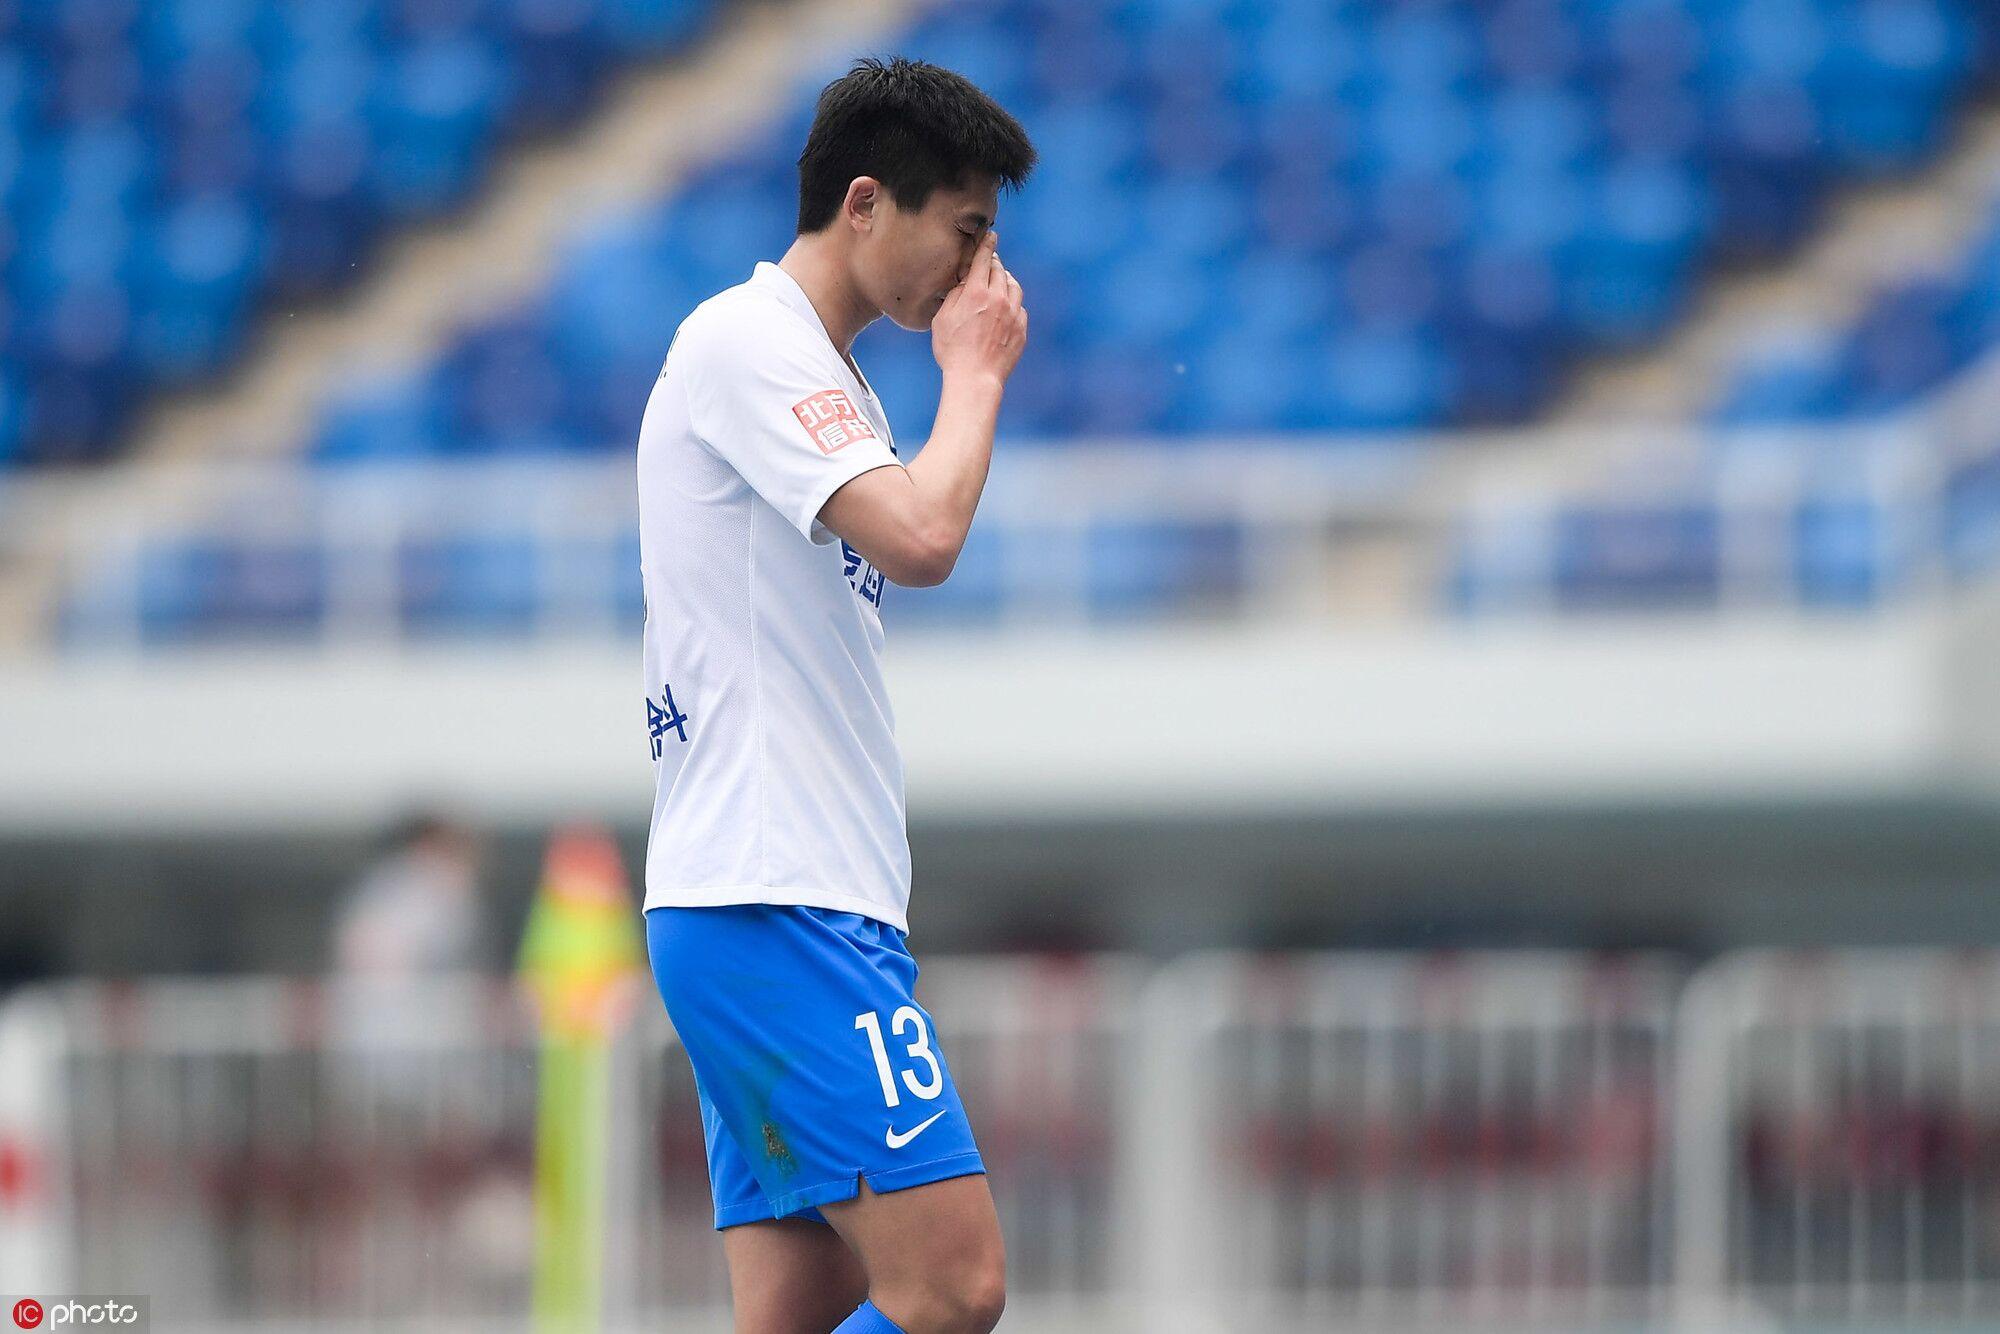 ac米兰vs国际米兰 再染红!郑凯木成本赛季首位吃到两张红牌的球员